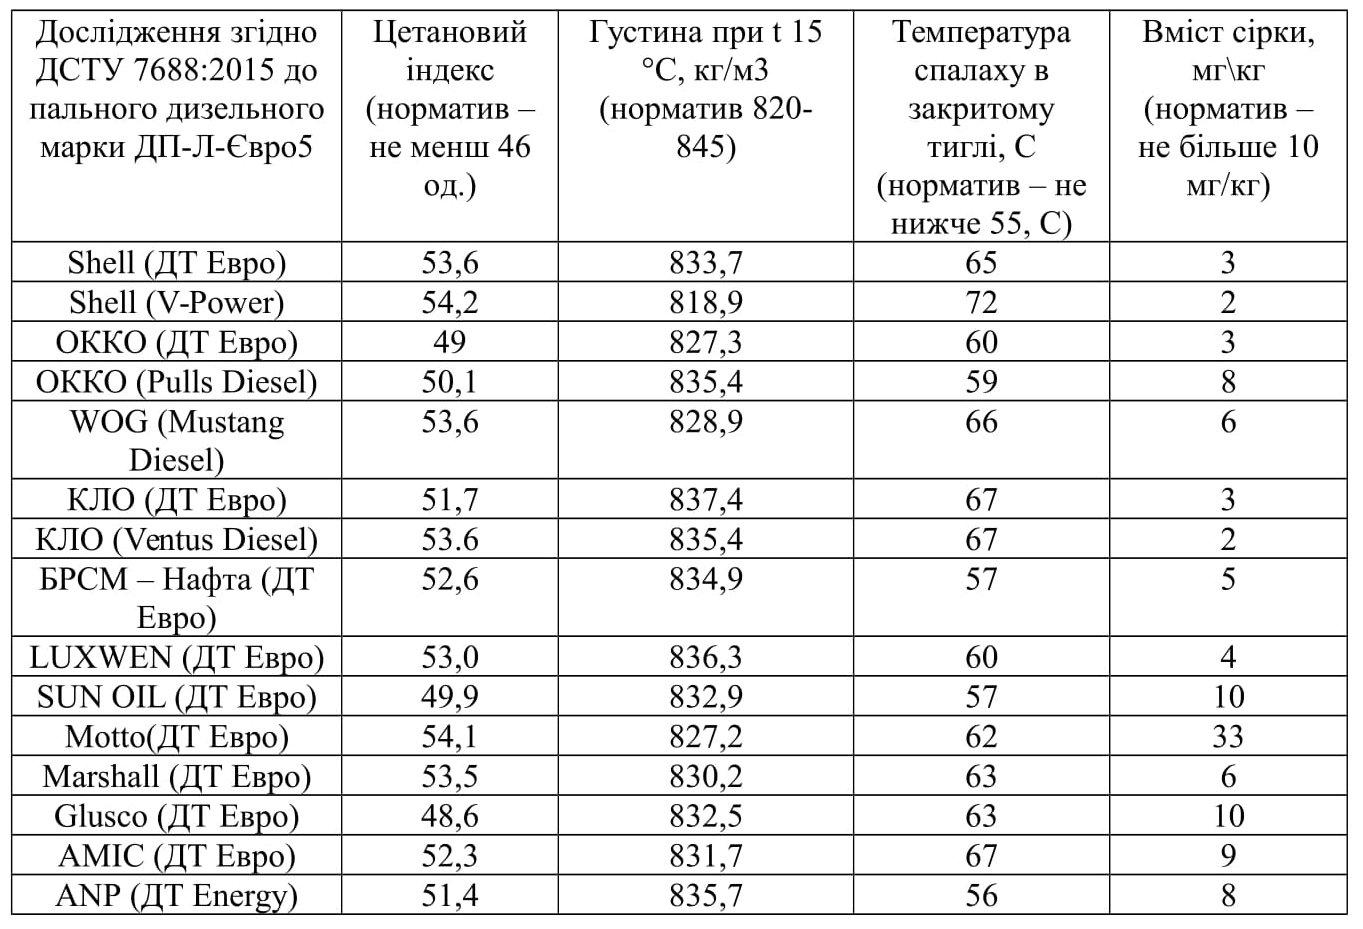 1tablicya_evrodizel-1.jpg (230.97 Kb)